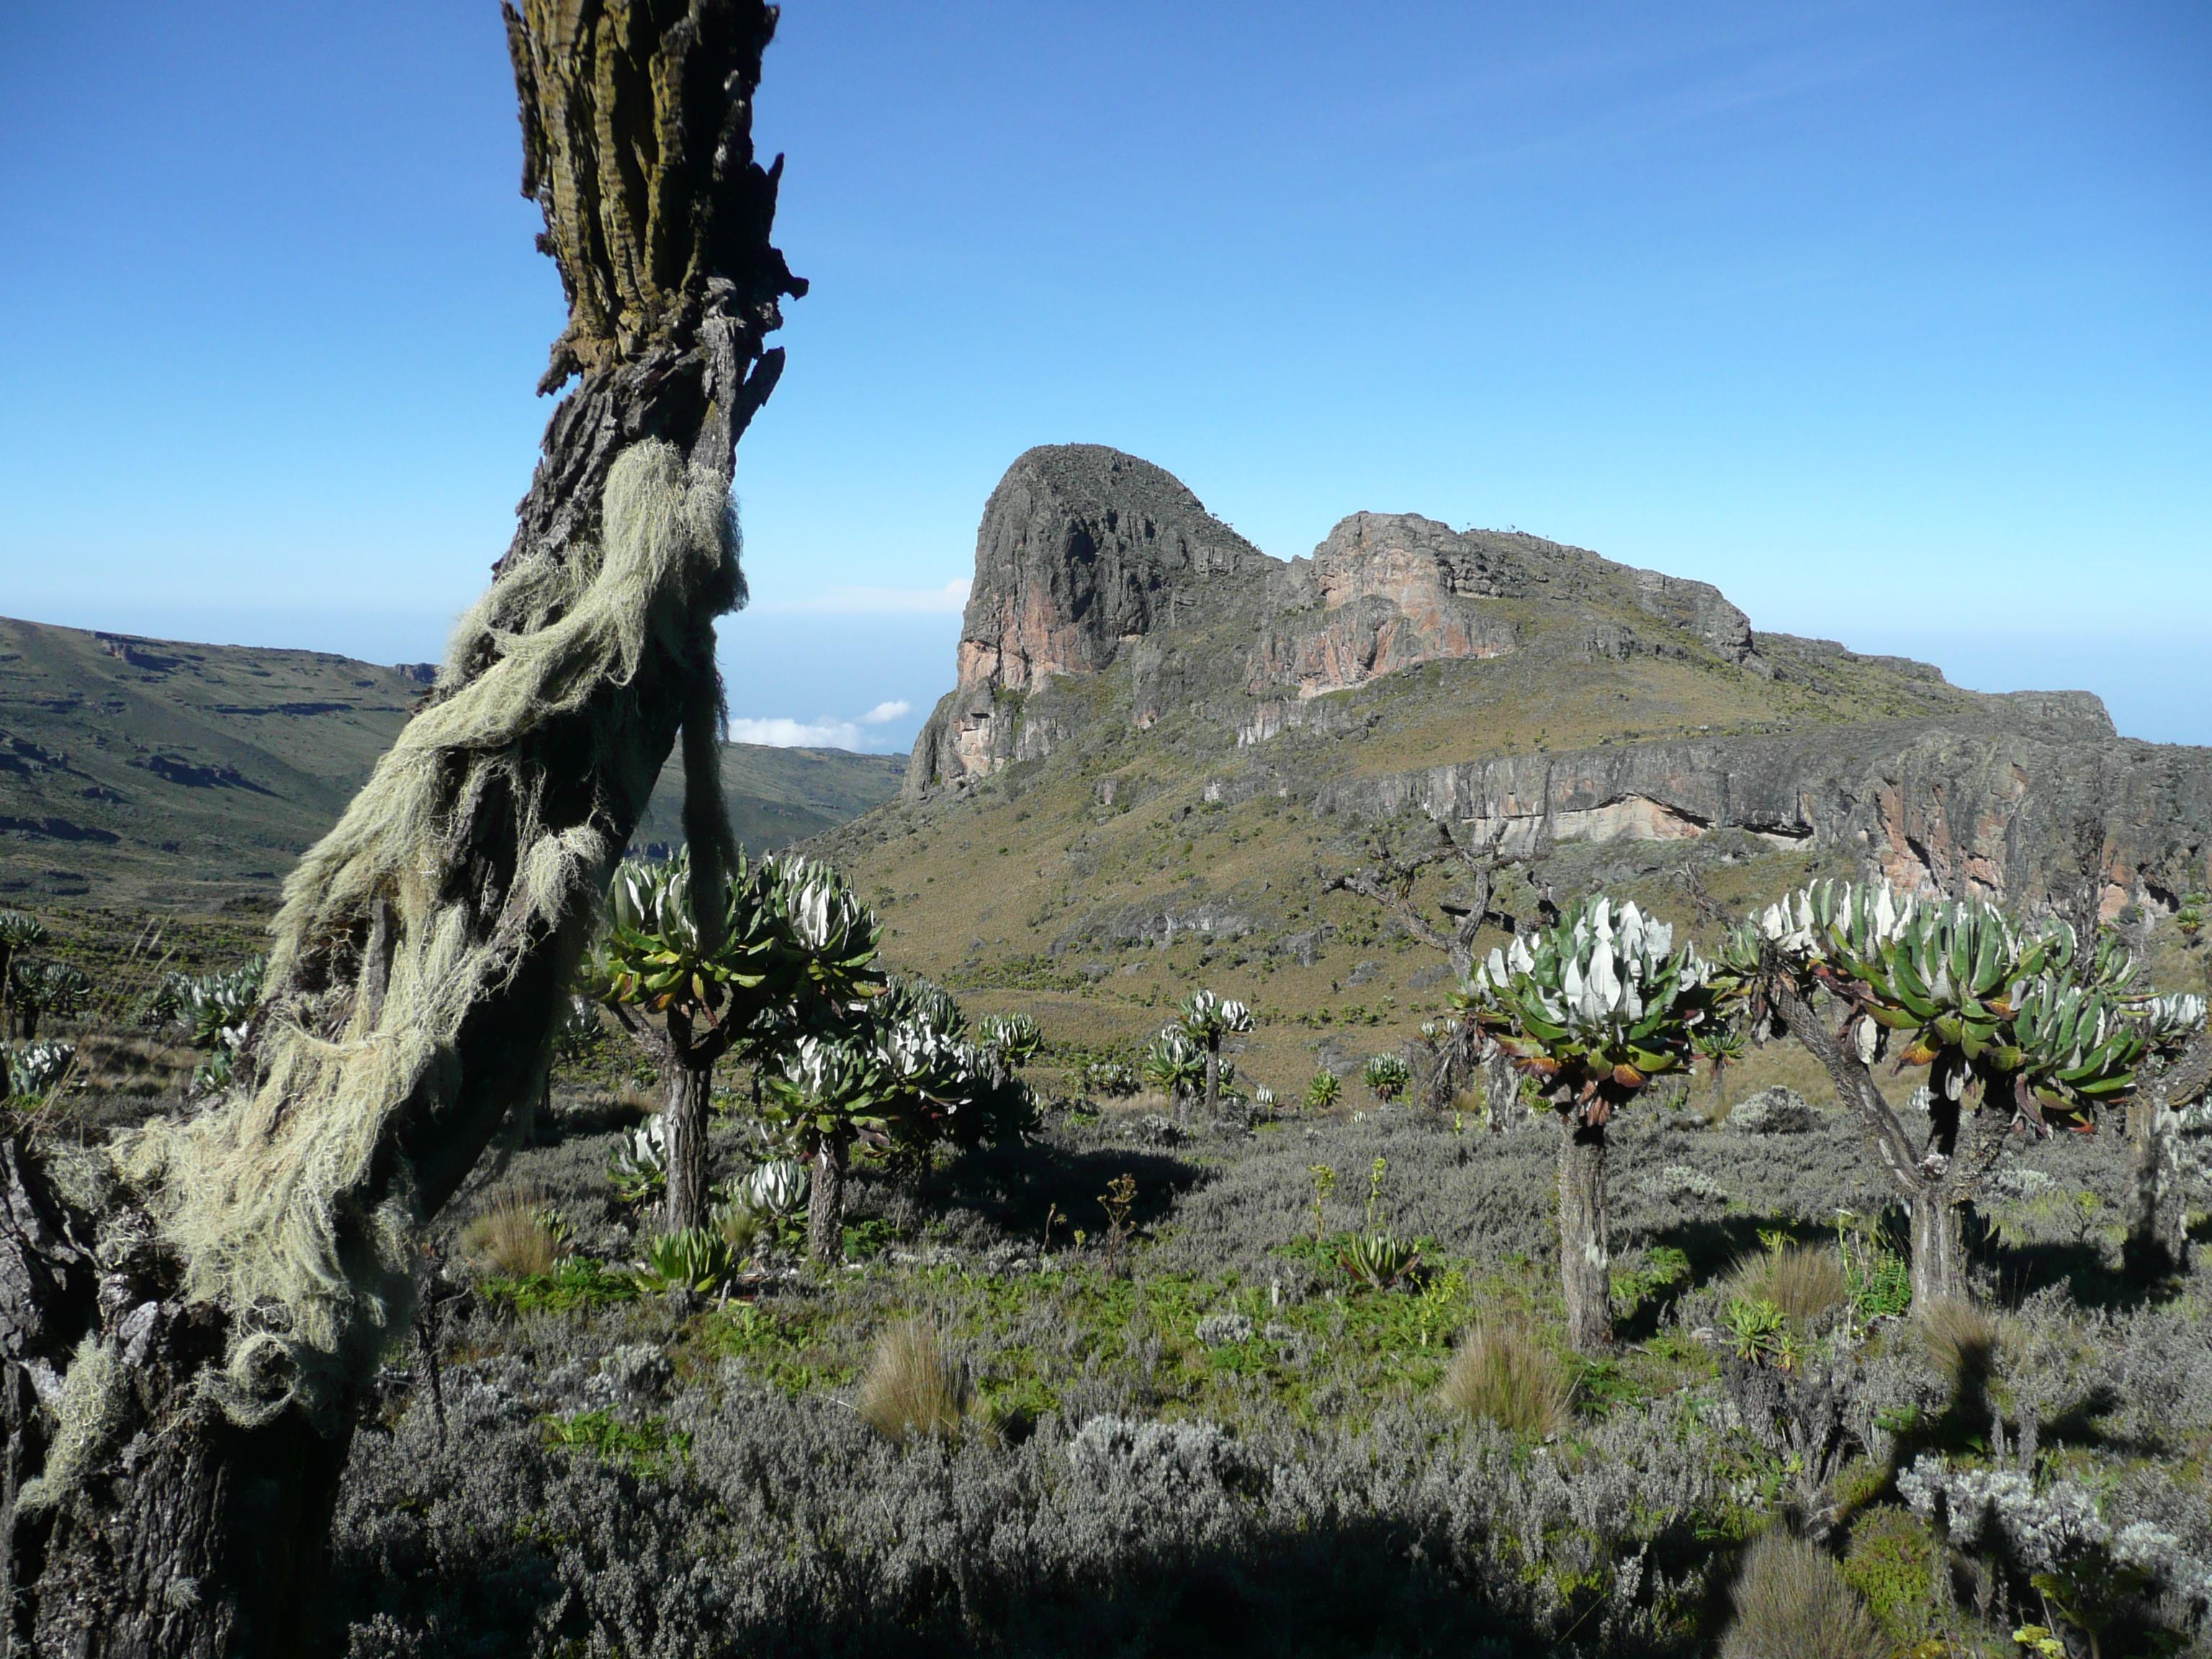 Jackson Summit, one of the many subsidiary peaks on Mount Elgon.